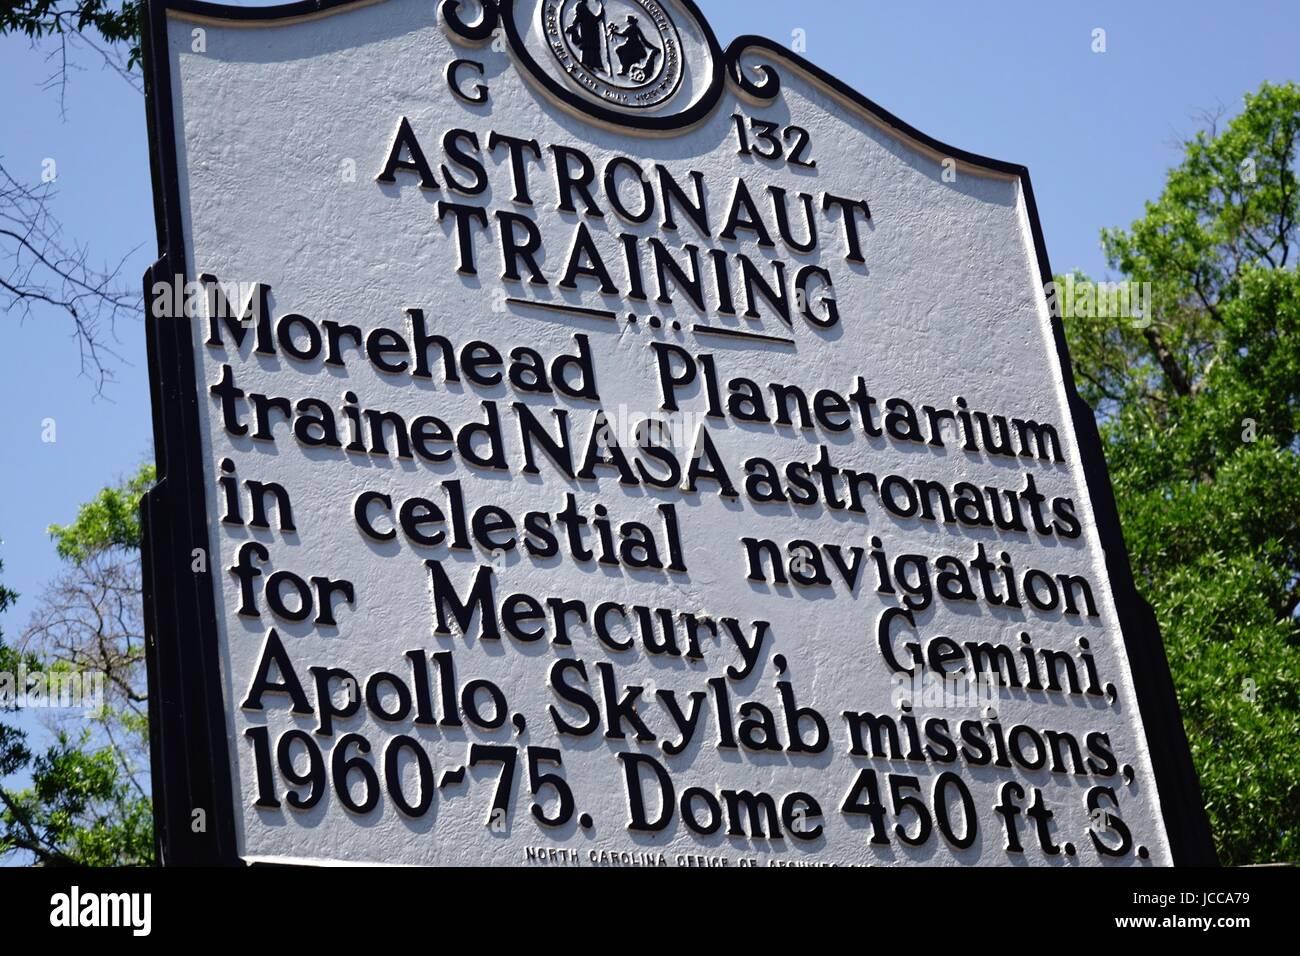 Plaque commemorating training NASA astronauts at Morehead Planetarium, University of North Carolina, Chapel Hill, North Carolina Stock Photo